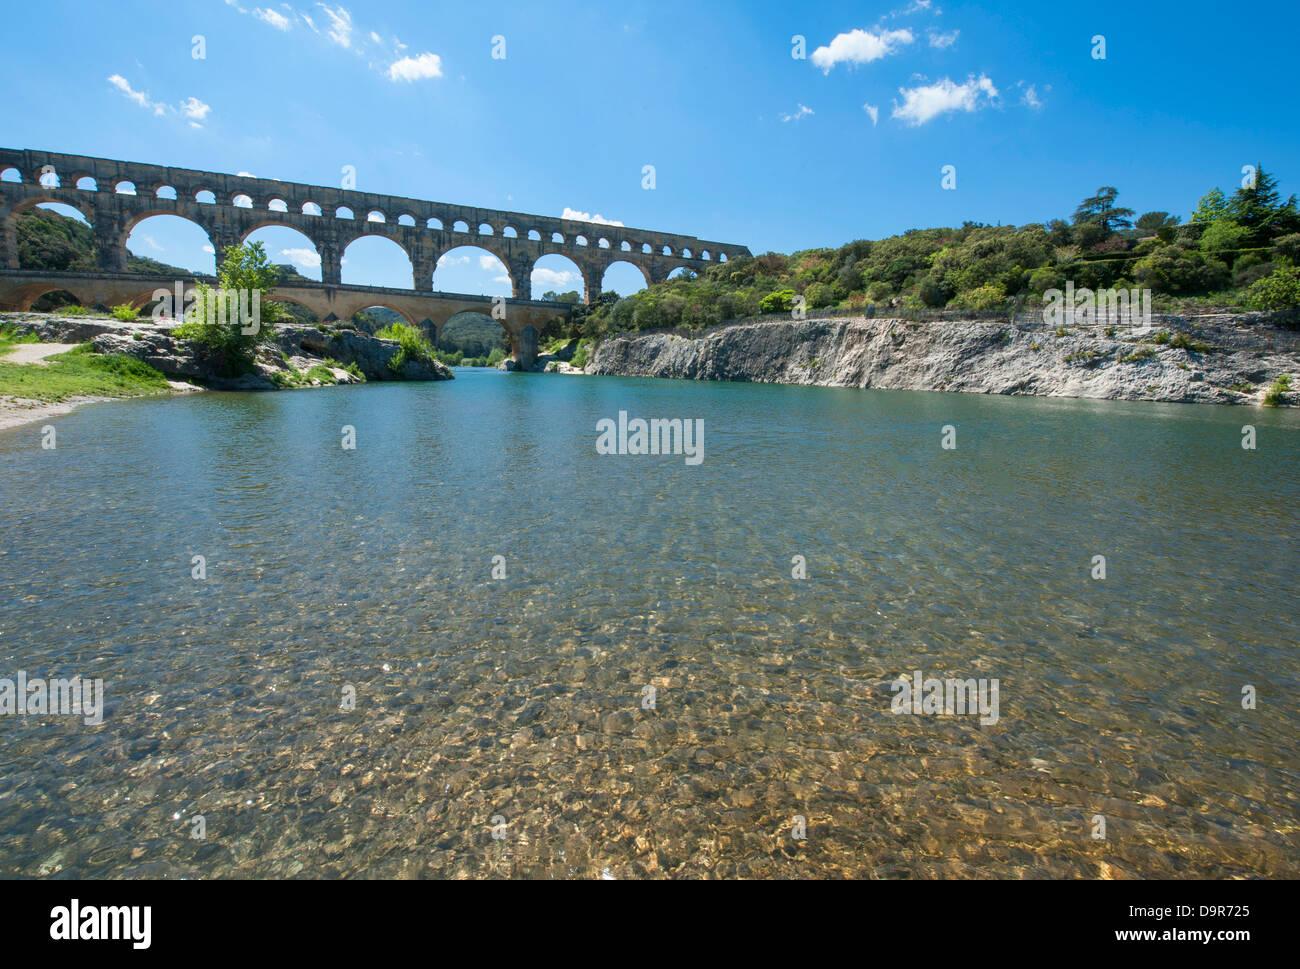 UNESCO world heritage Pont du Gard, a Roman aqueduct near Nîmes in the Gard, seen from the banks of the Gardon river. Stock Photo